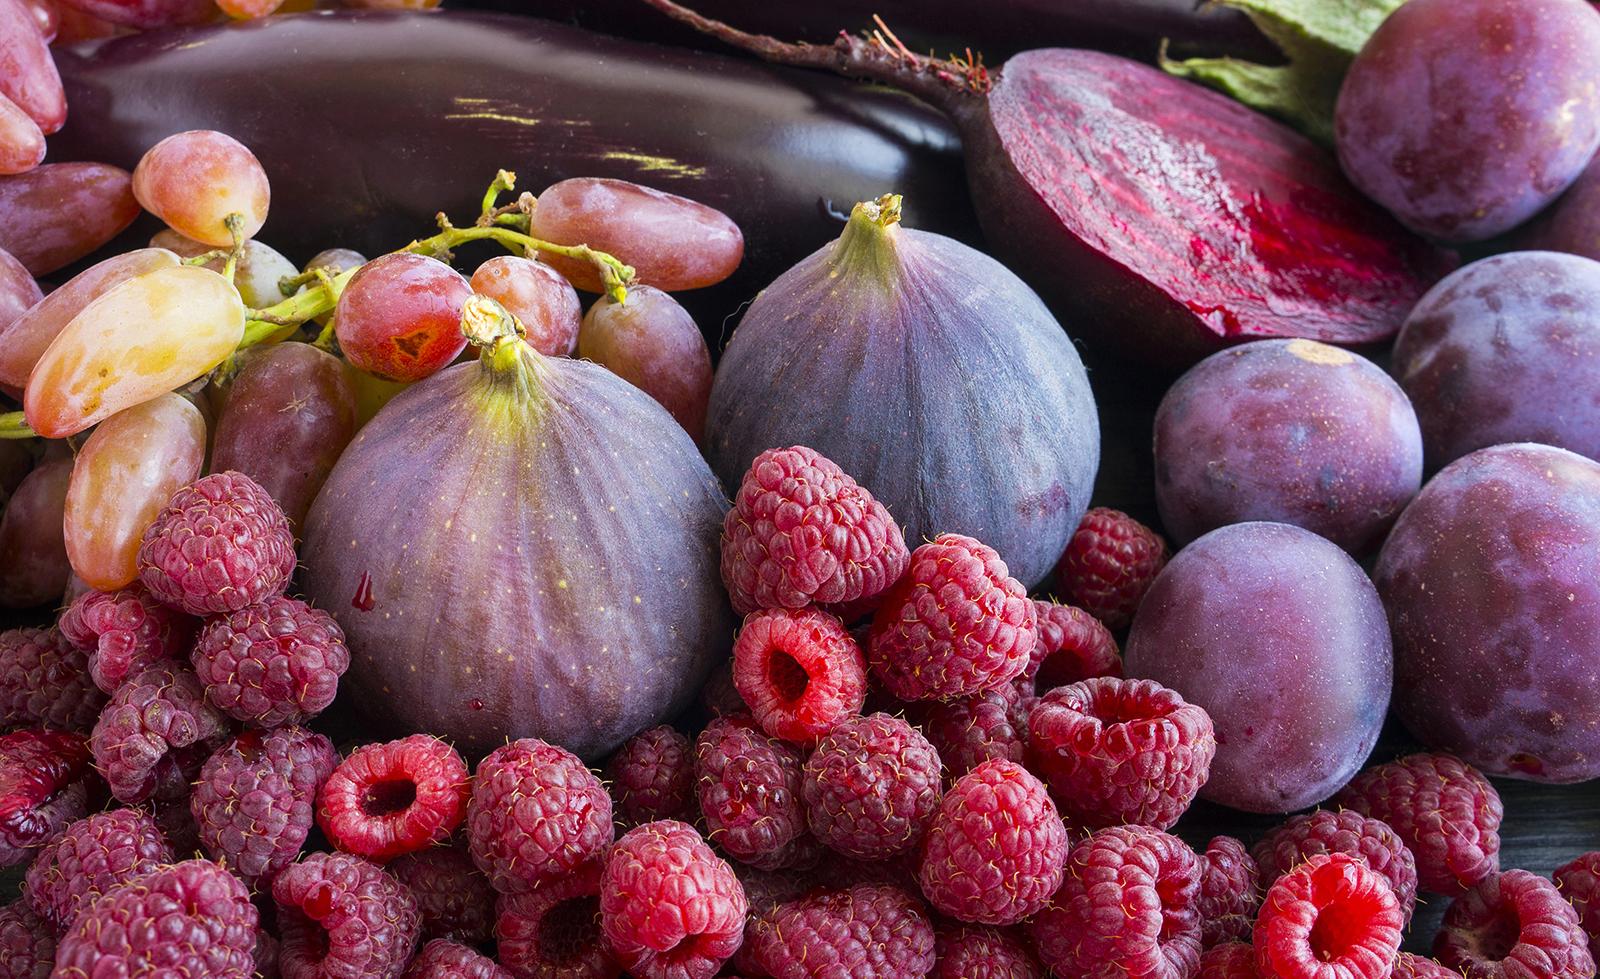 goji-berries-purple-berries-fruit